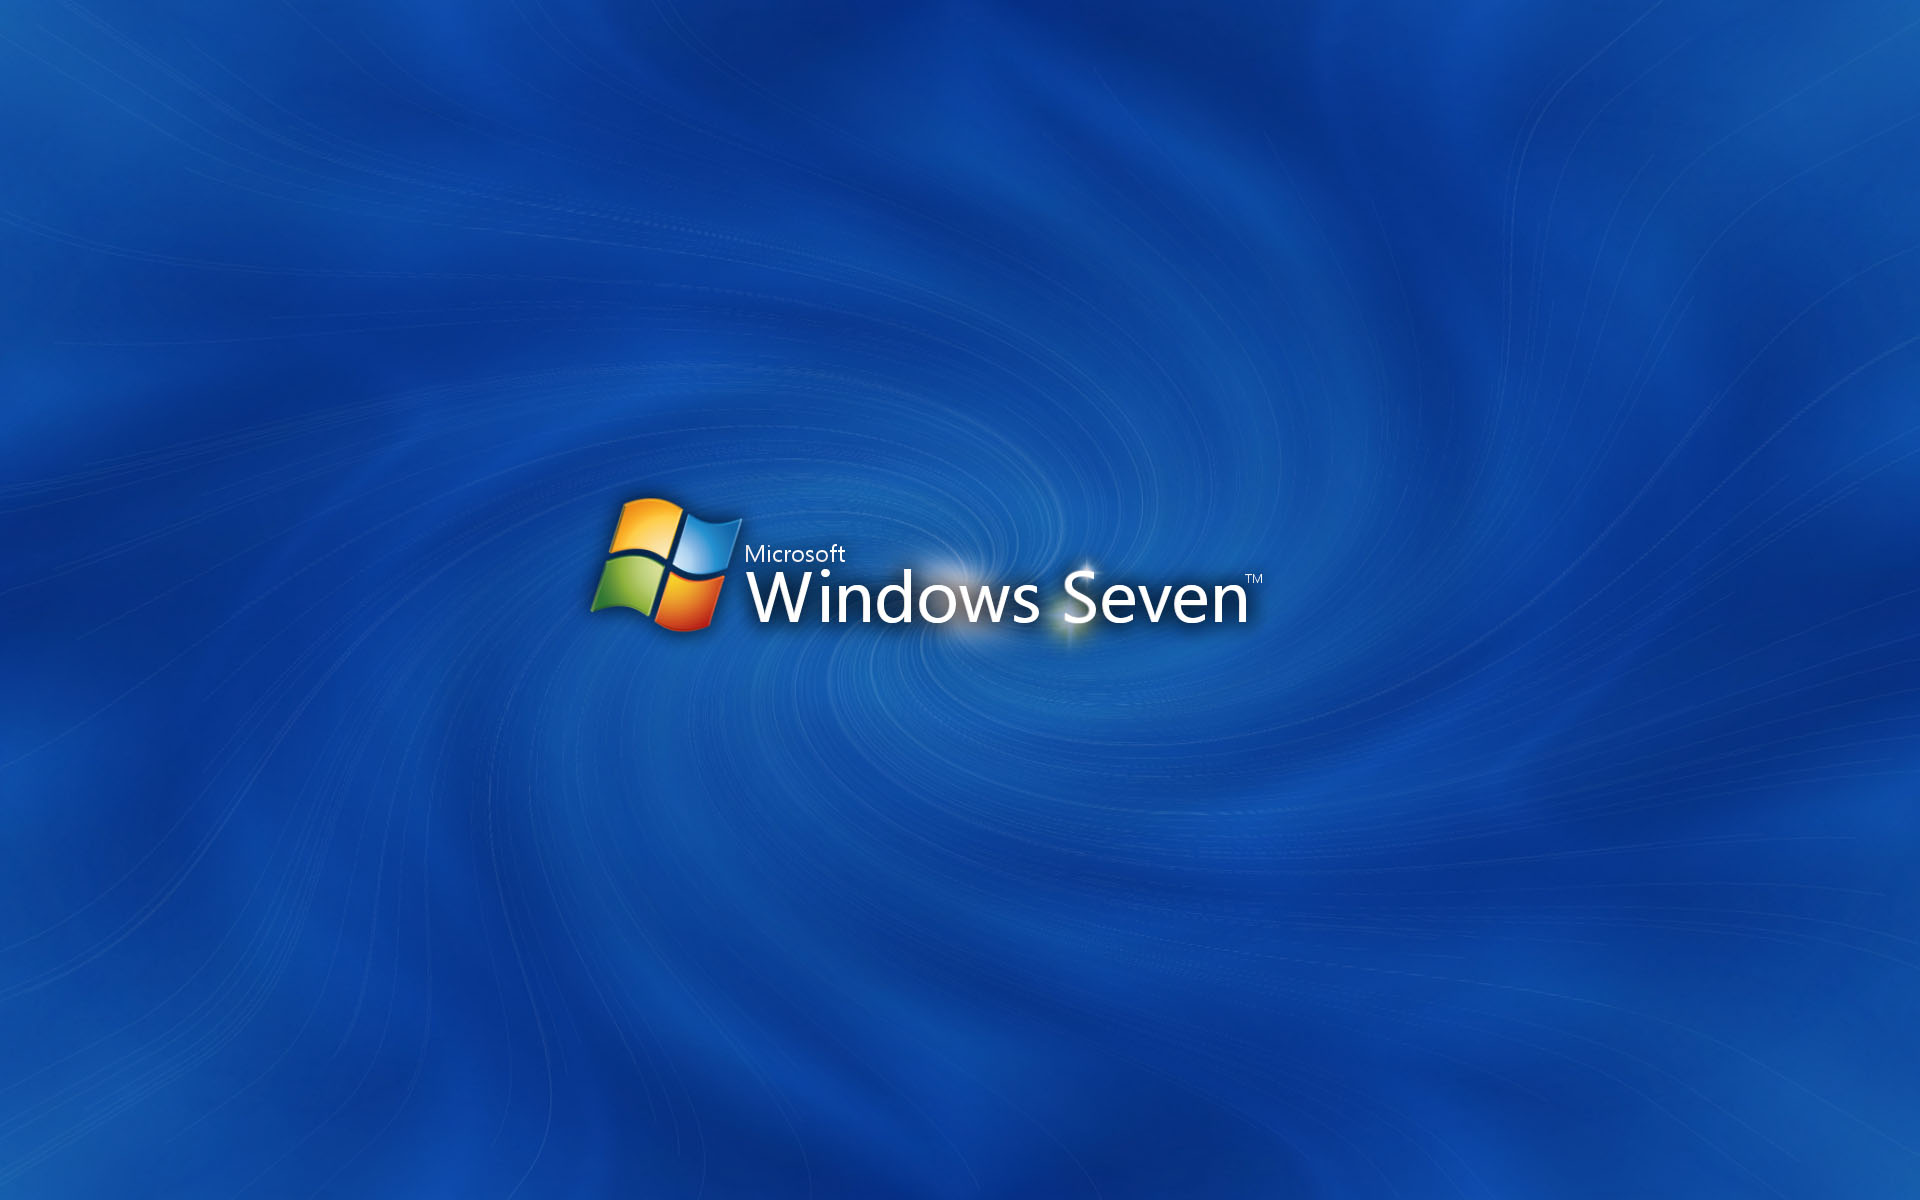 Windows 7 Ultimate wallpaper - 224502